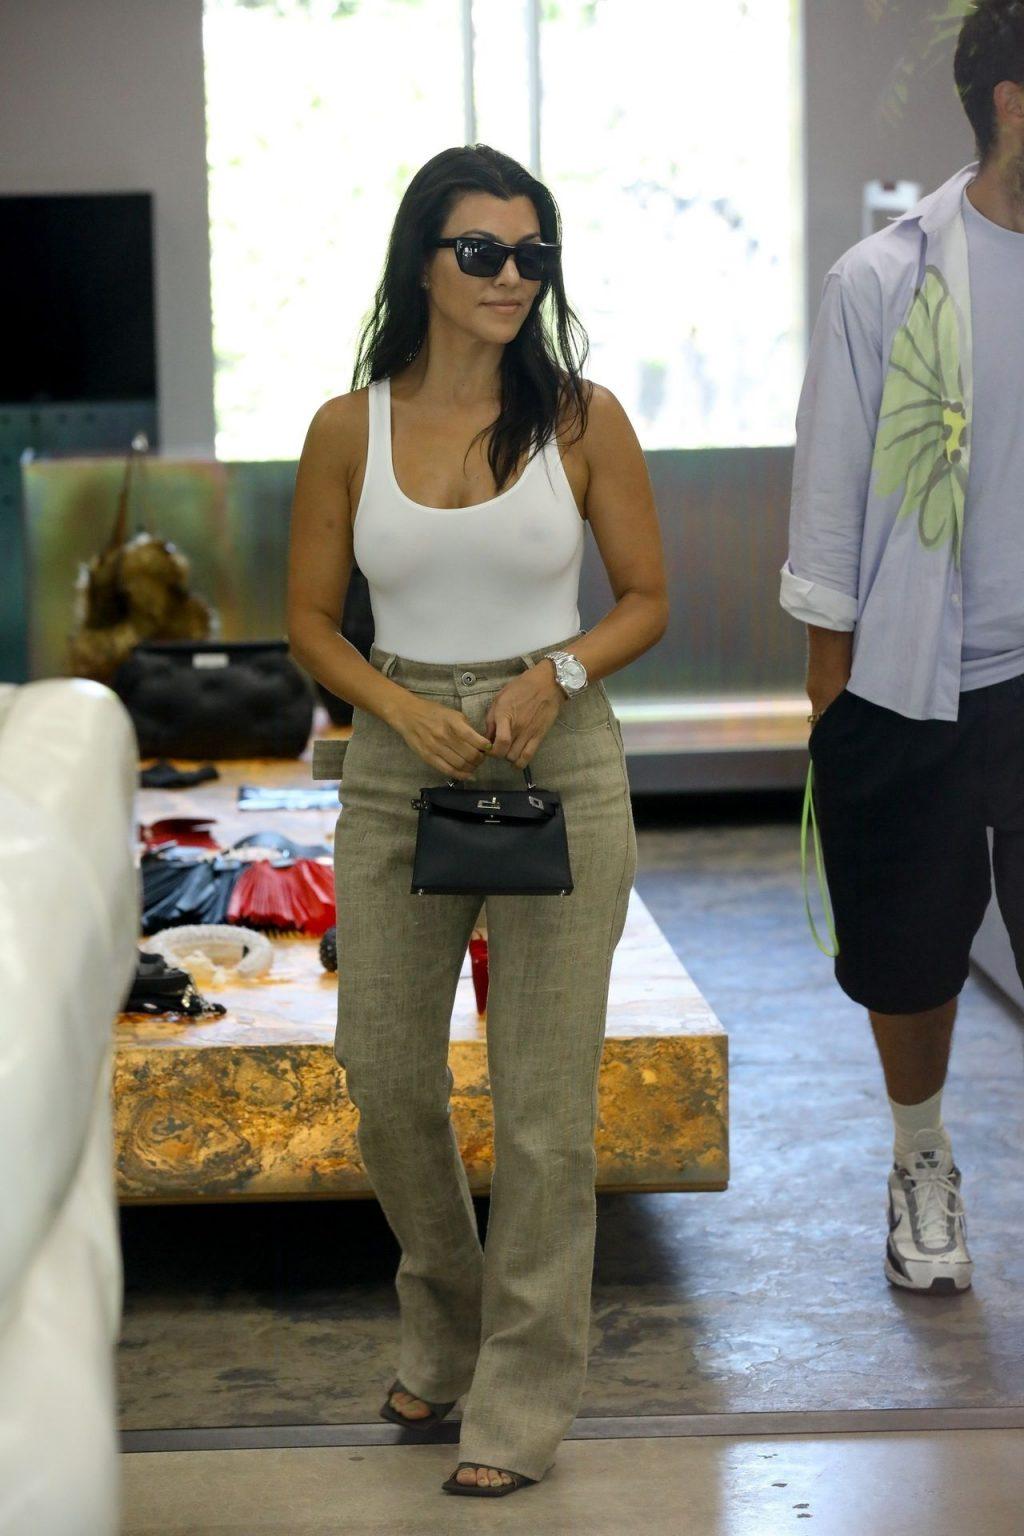 Kourtney Kardashian See Through Thefappeningblog Com 143 102